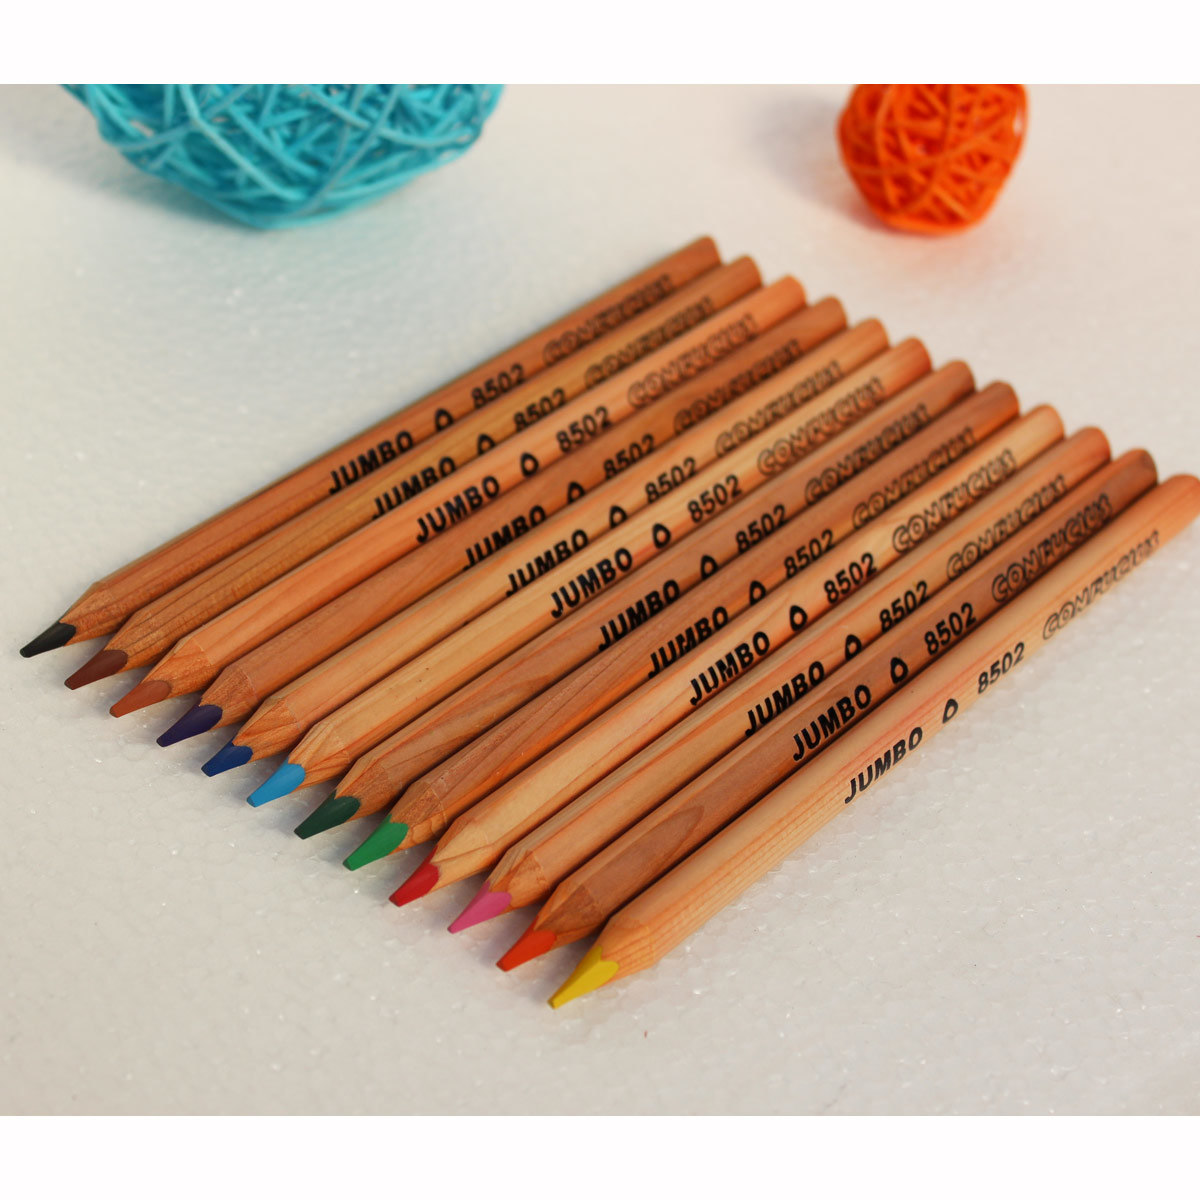 Jumbo Size 12 Color Pencils Stationery, Jumbo Pencils